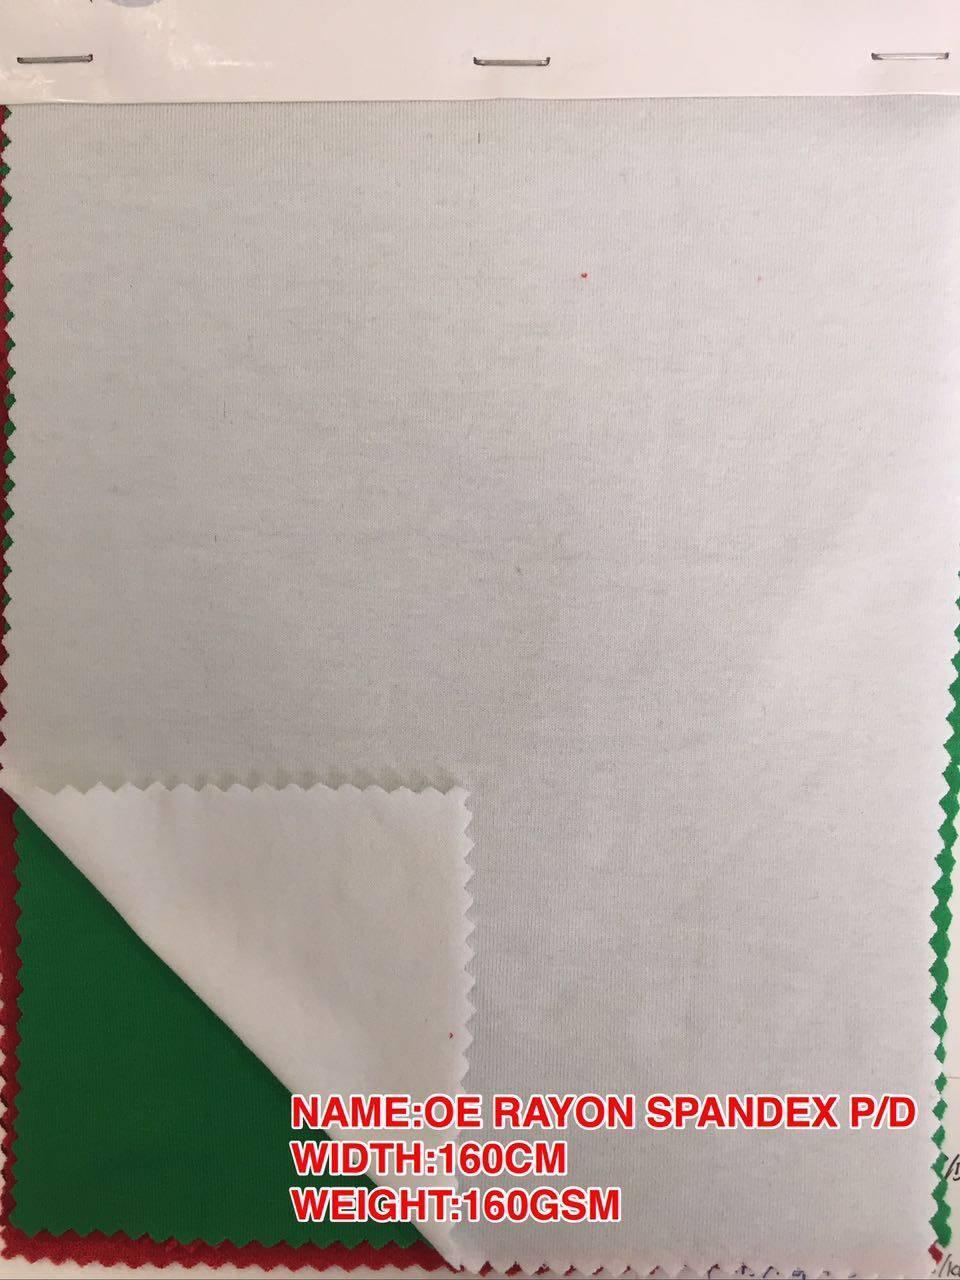 OE RAYON SPANDEX P/D